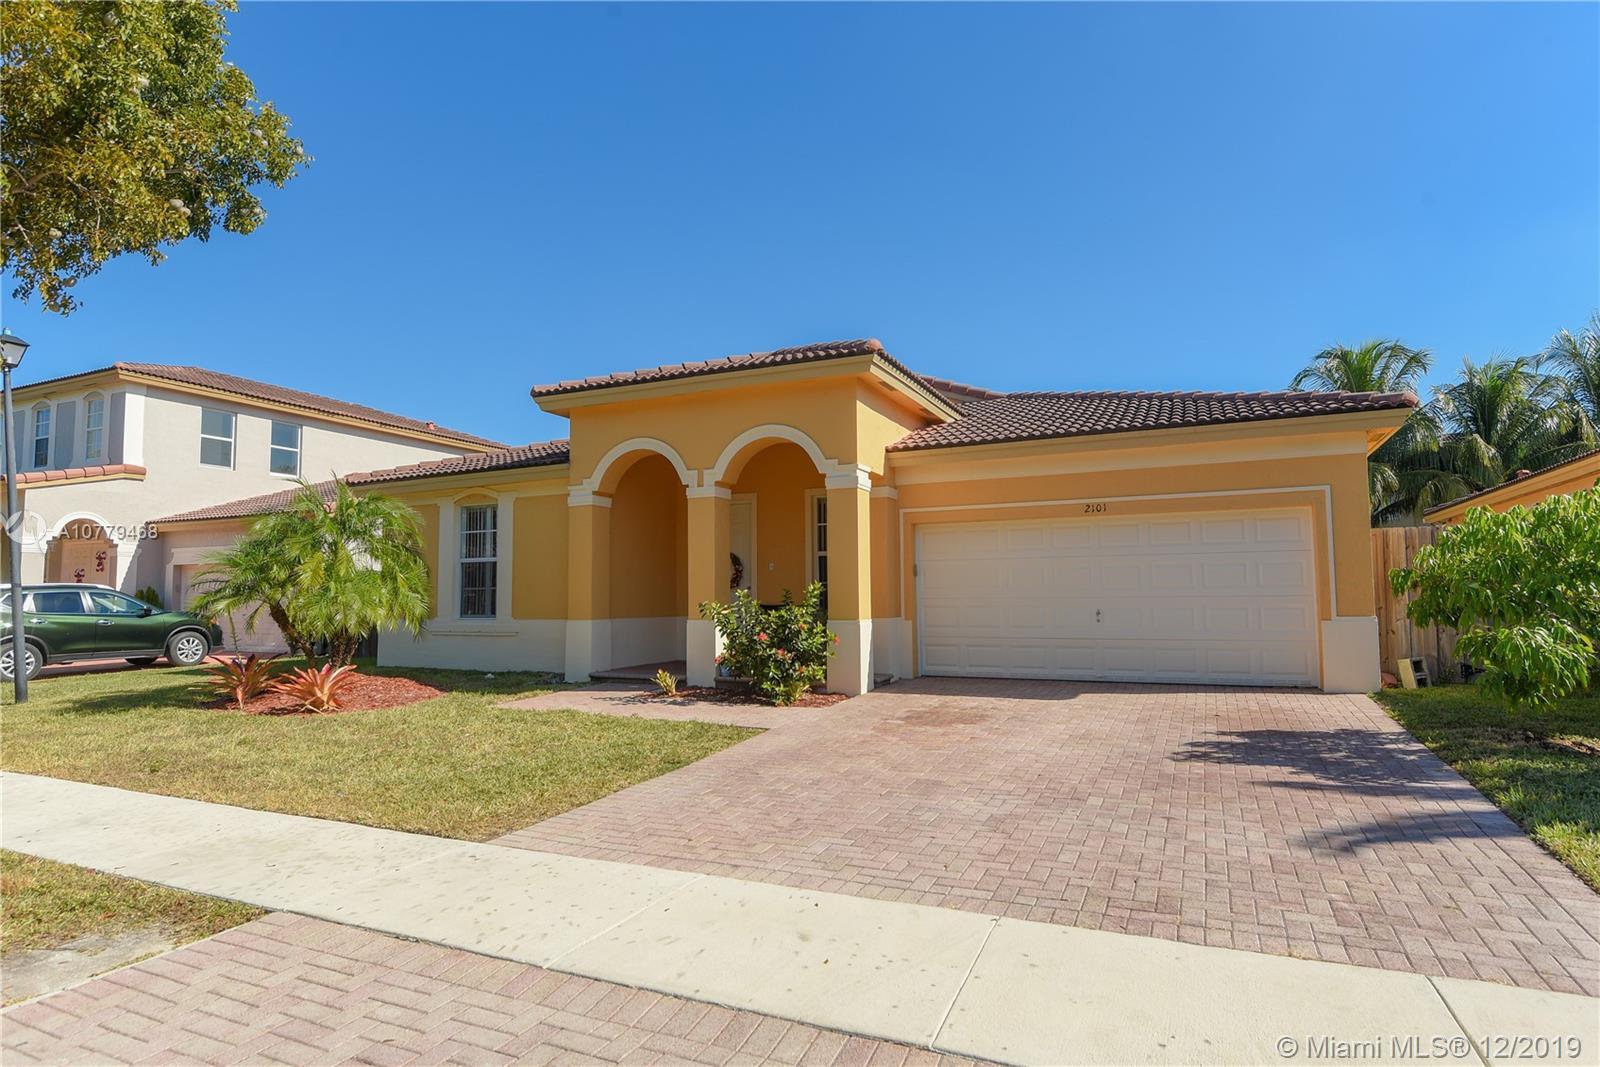 2101 NE 40th Ave, Homestead, FL 33033 - Homestead, FL real estate listing